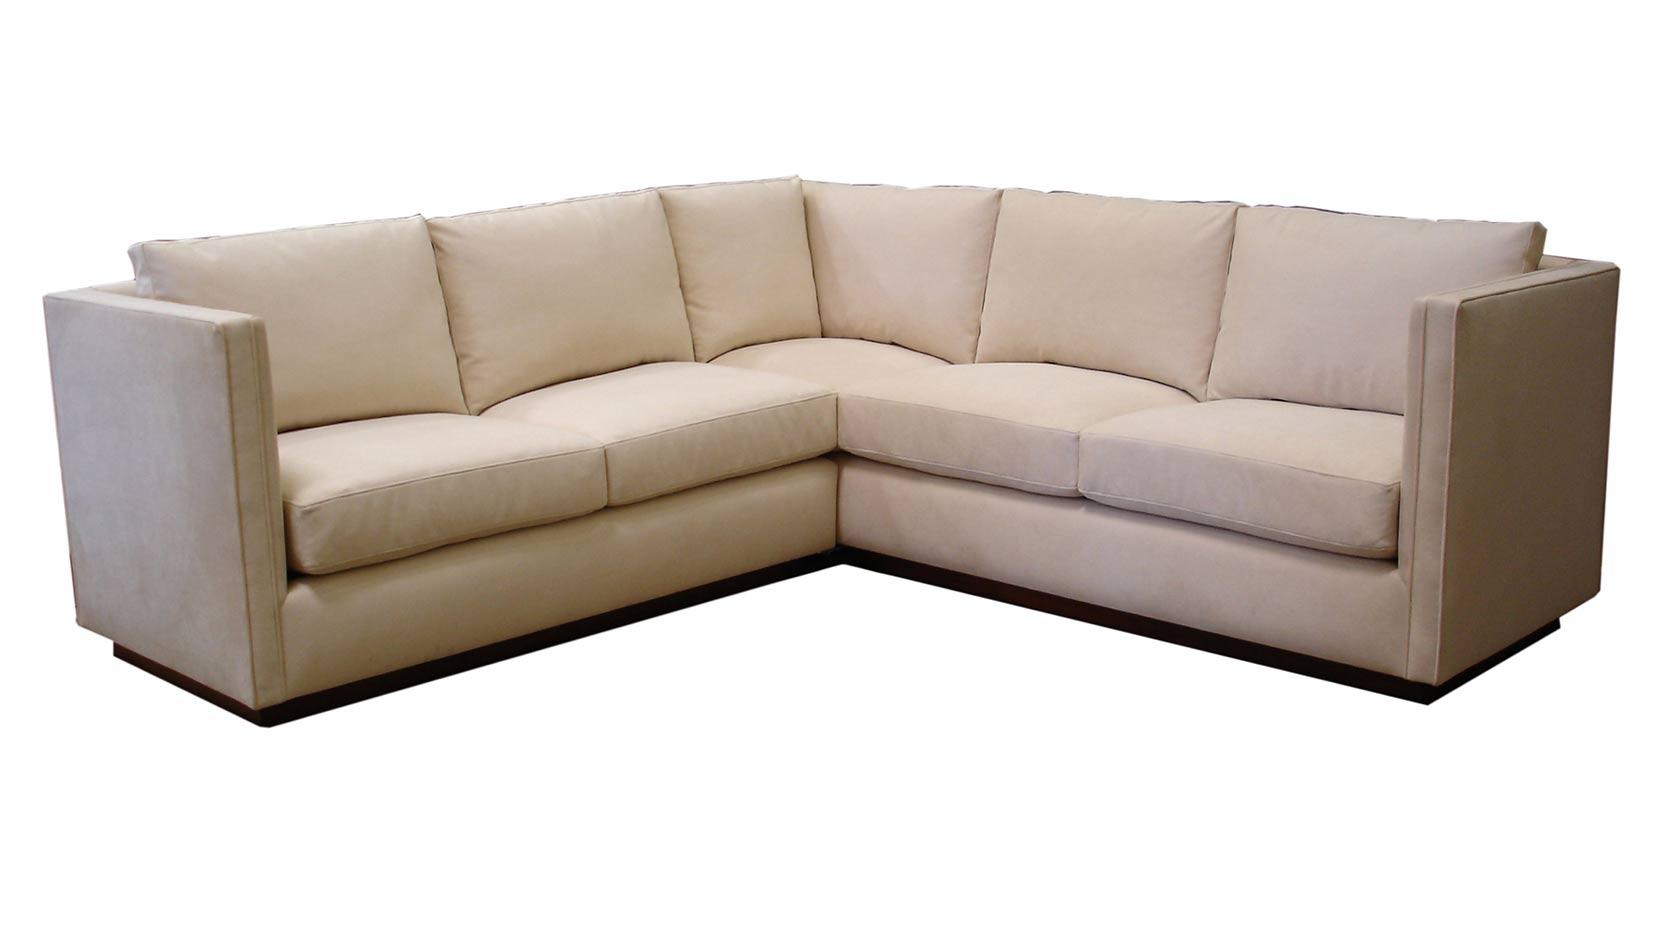 handmade sofas all leather sofa sets plush home custom sectionals